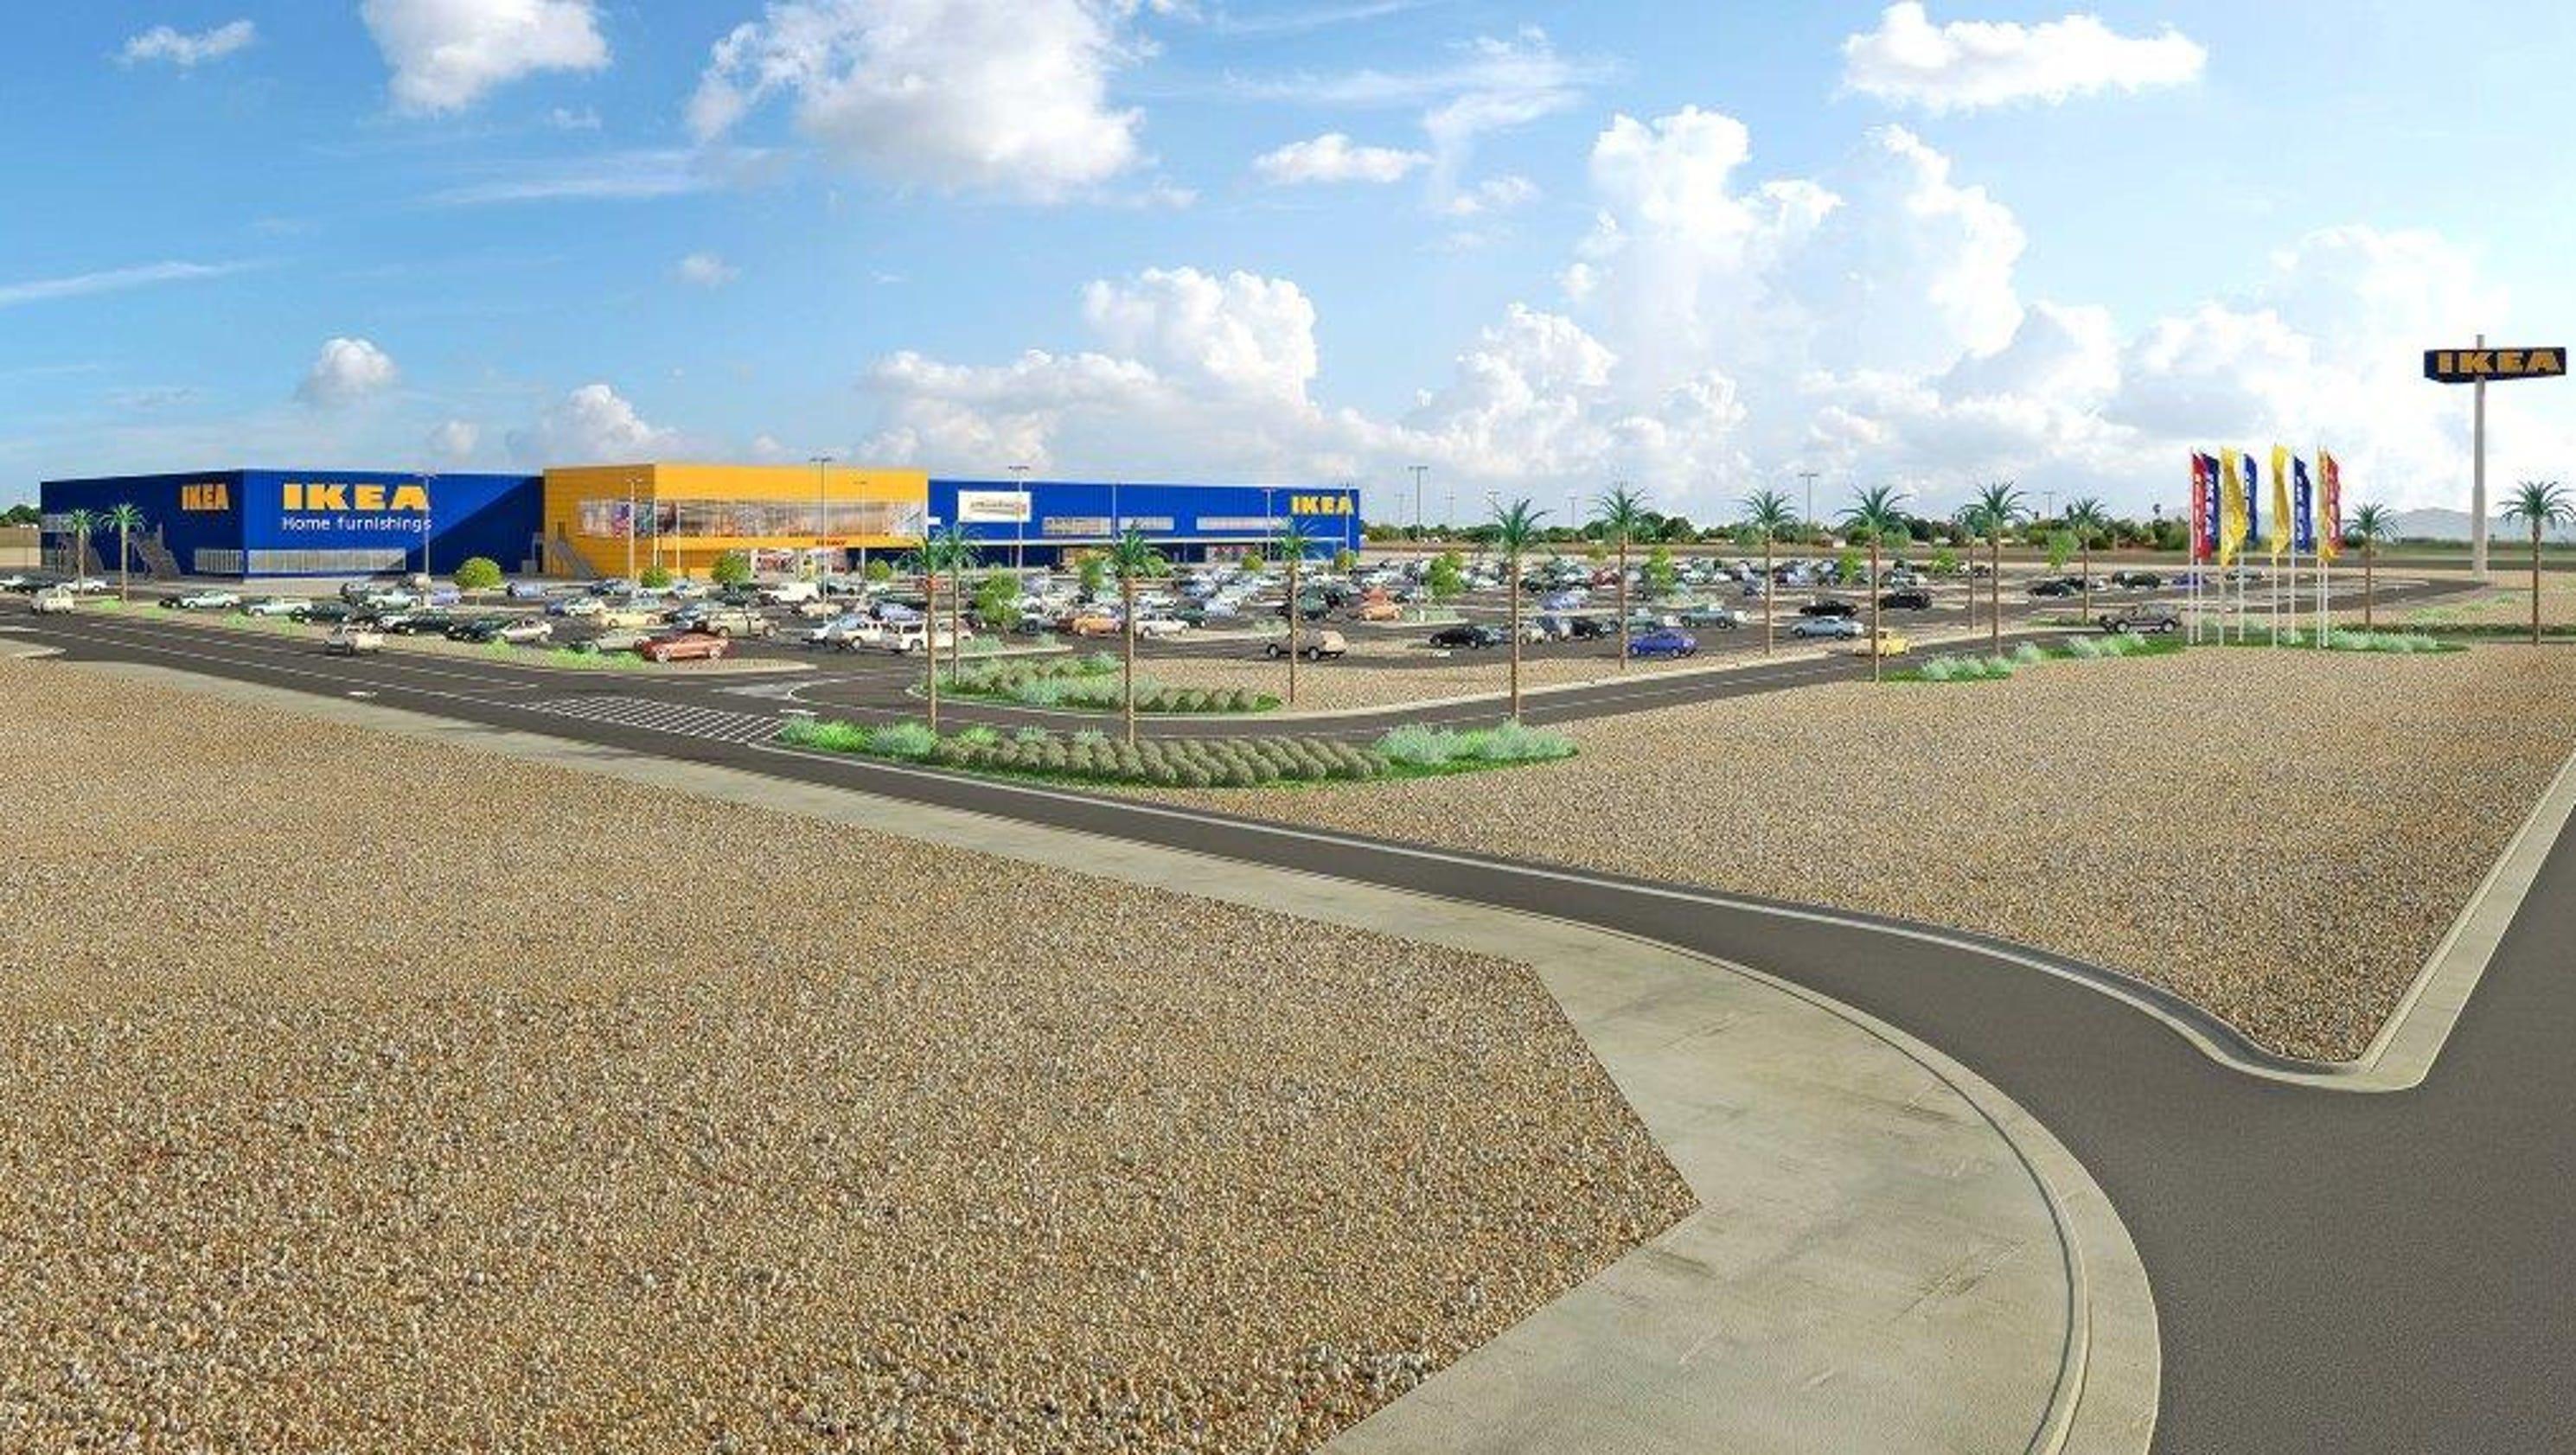 Ikea Opening Second Arizona Store In Glendale Near Cardinals Stadium